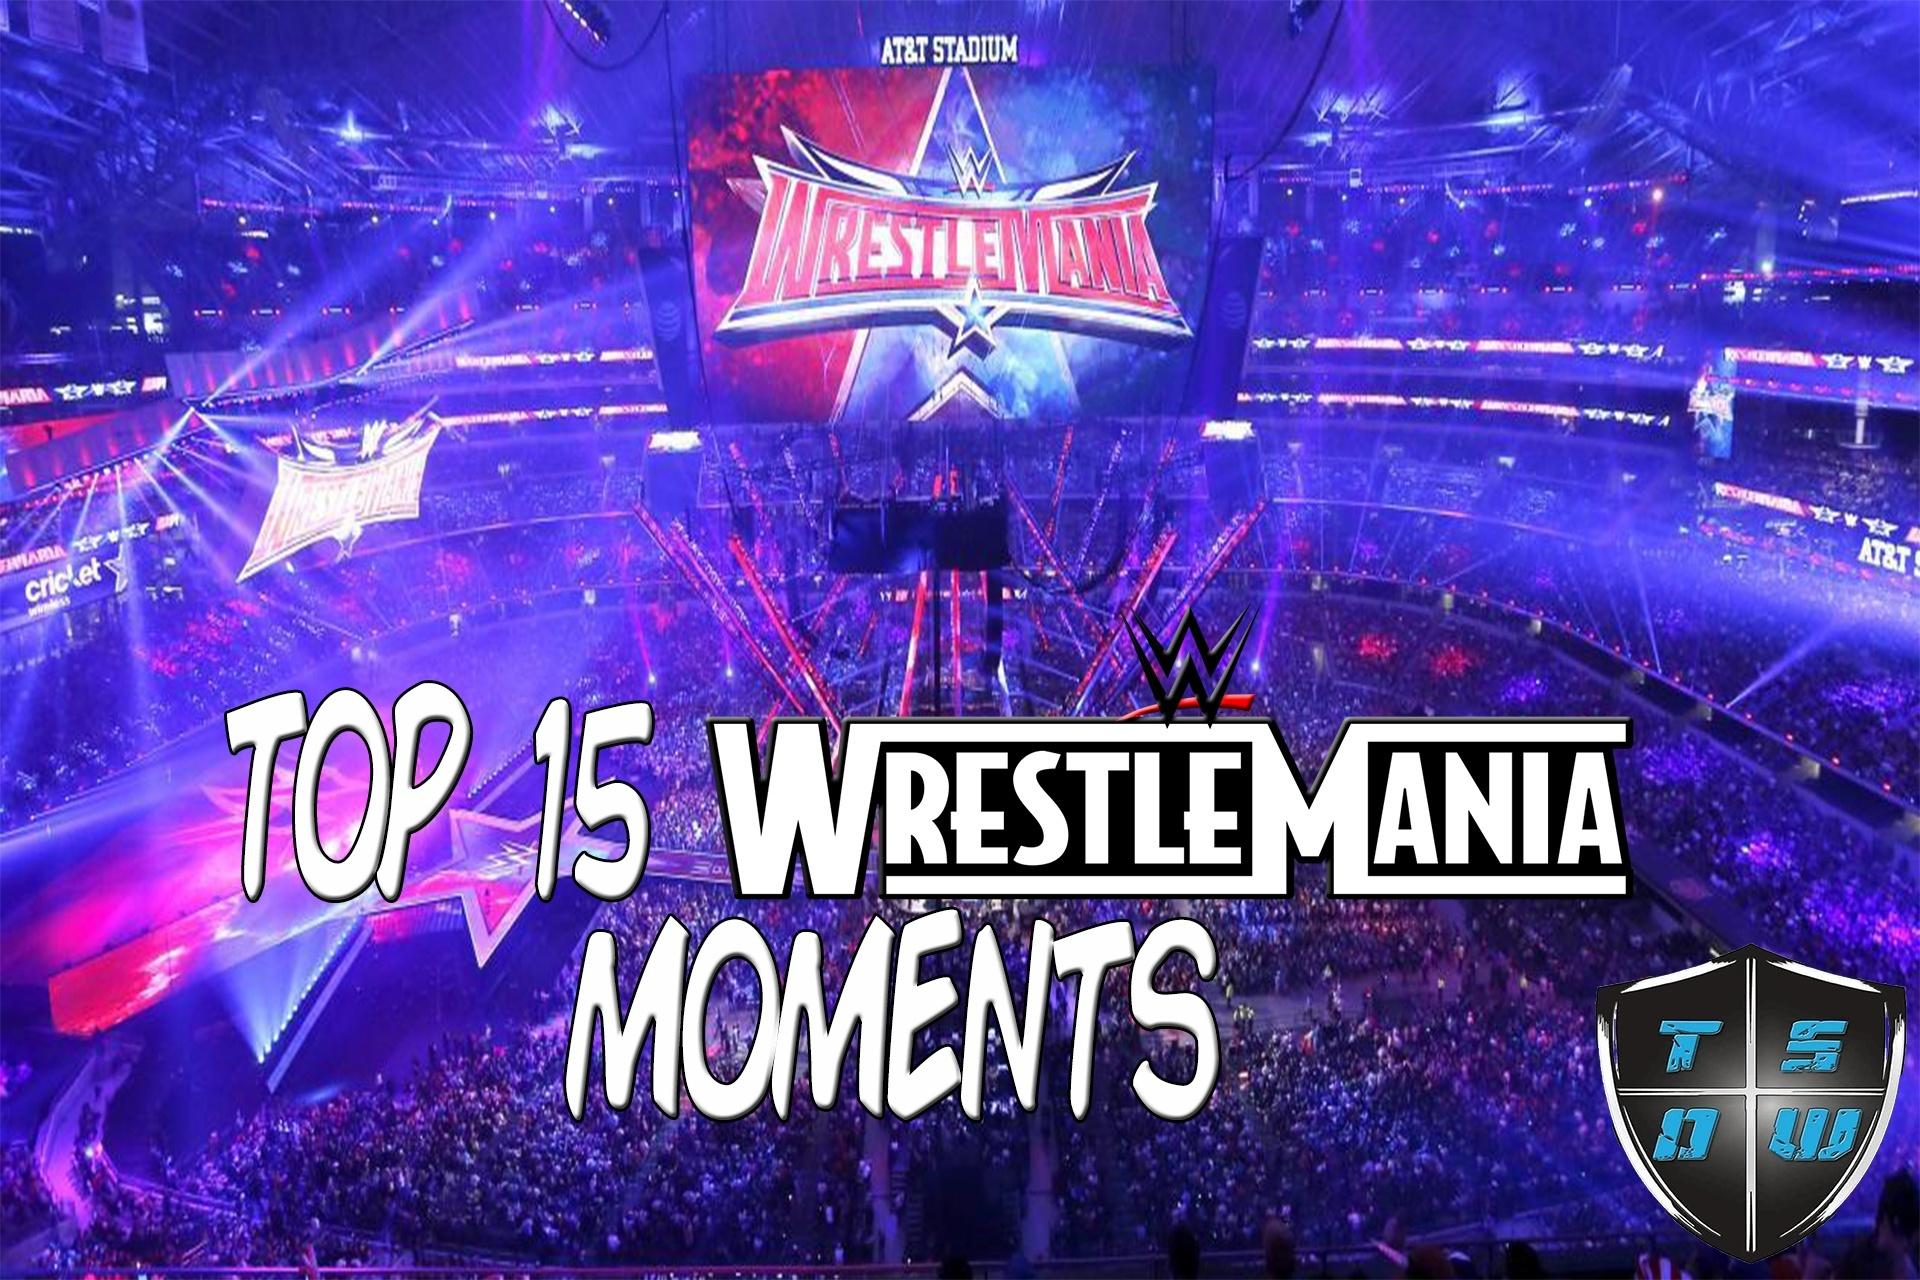 top 15 WrestleMania moments